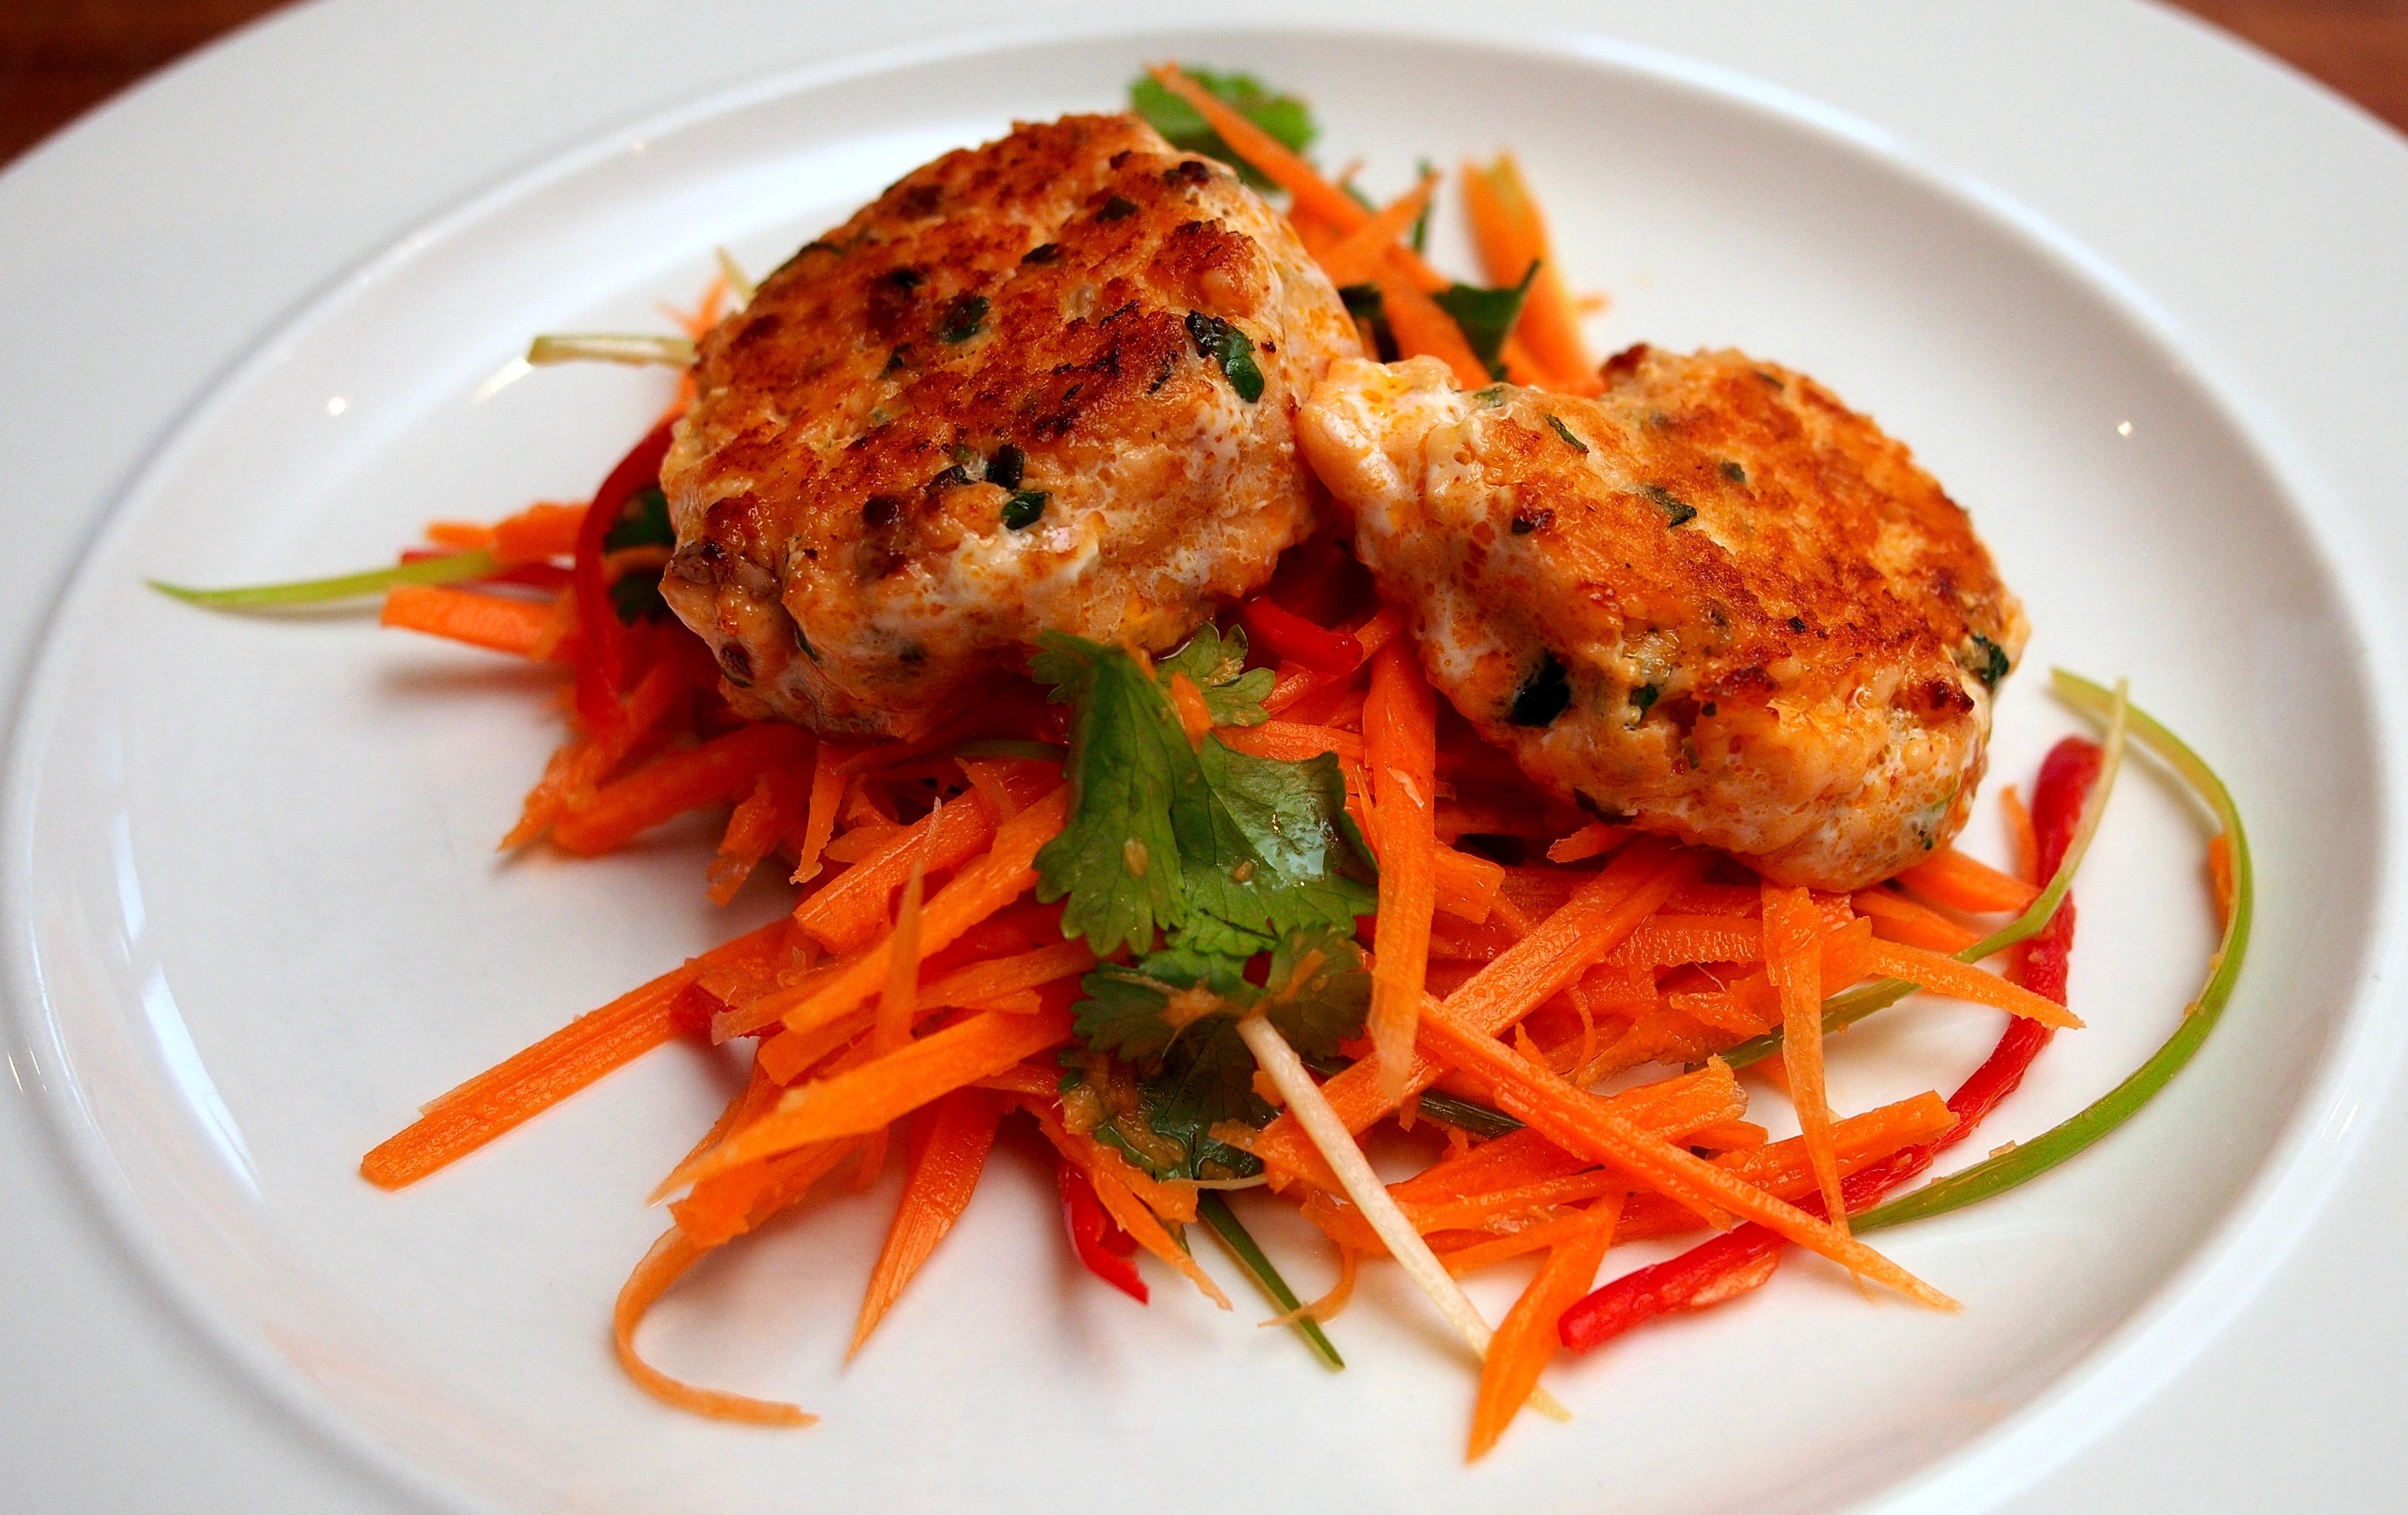 Thai salmon cakes with carrot salad